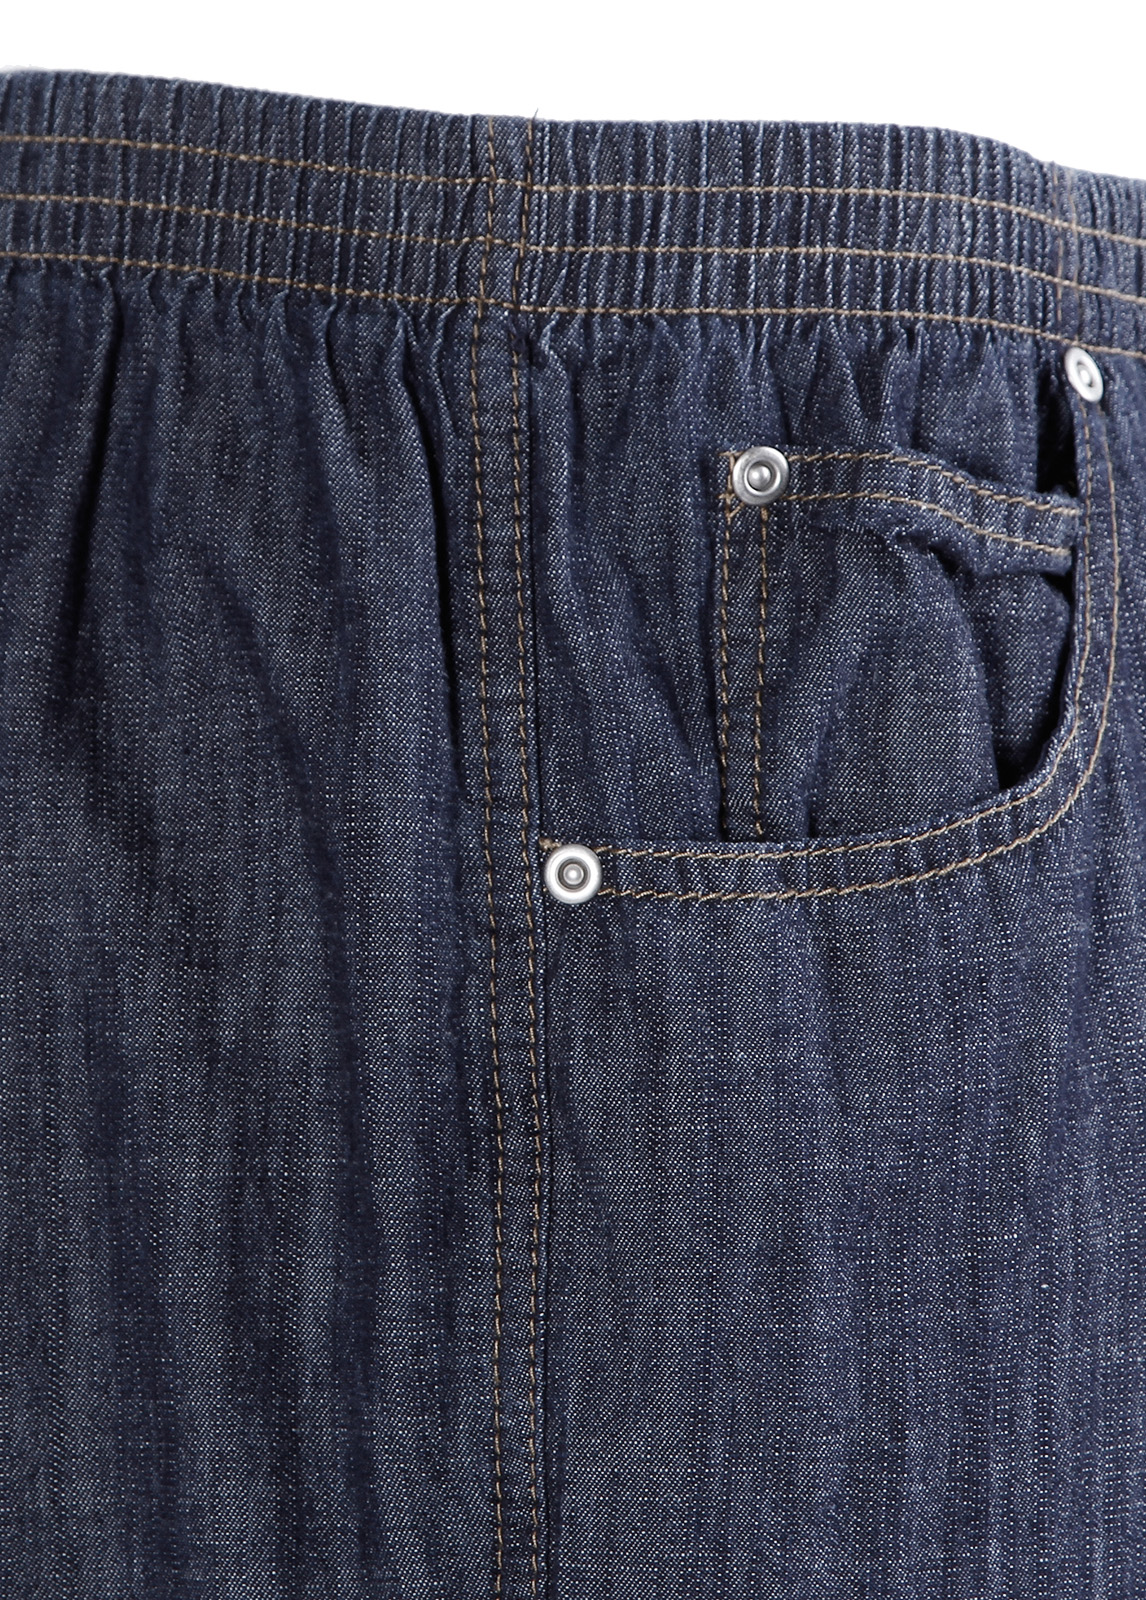 Women Ladies Dark Wash Elastic Waistband Jeans Straight ...